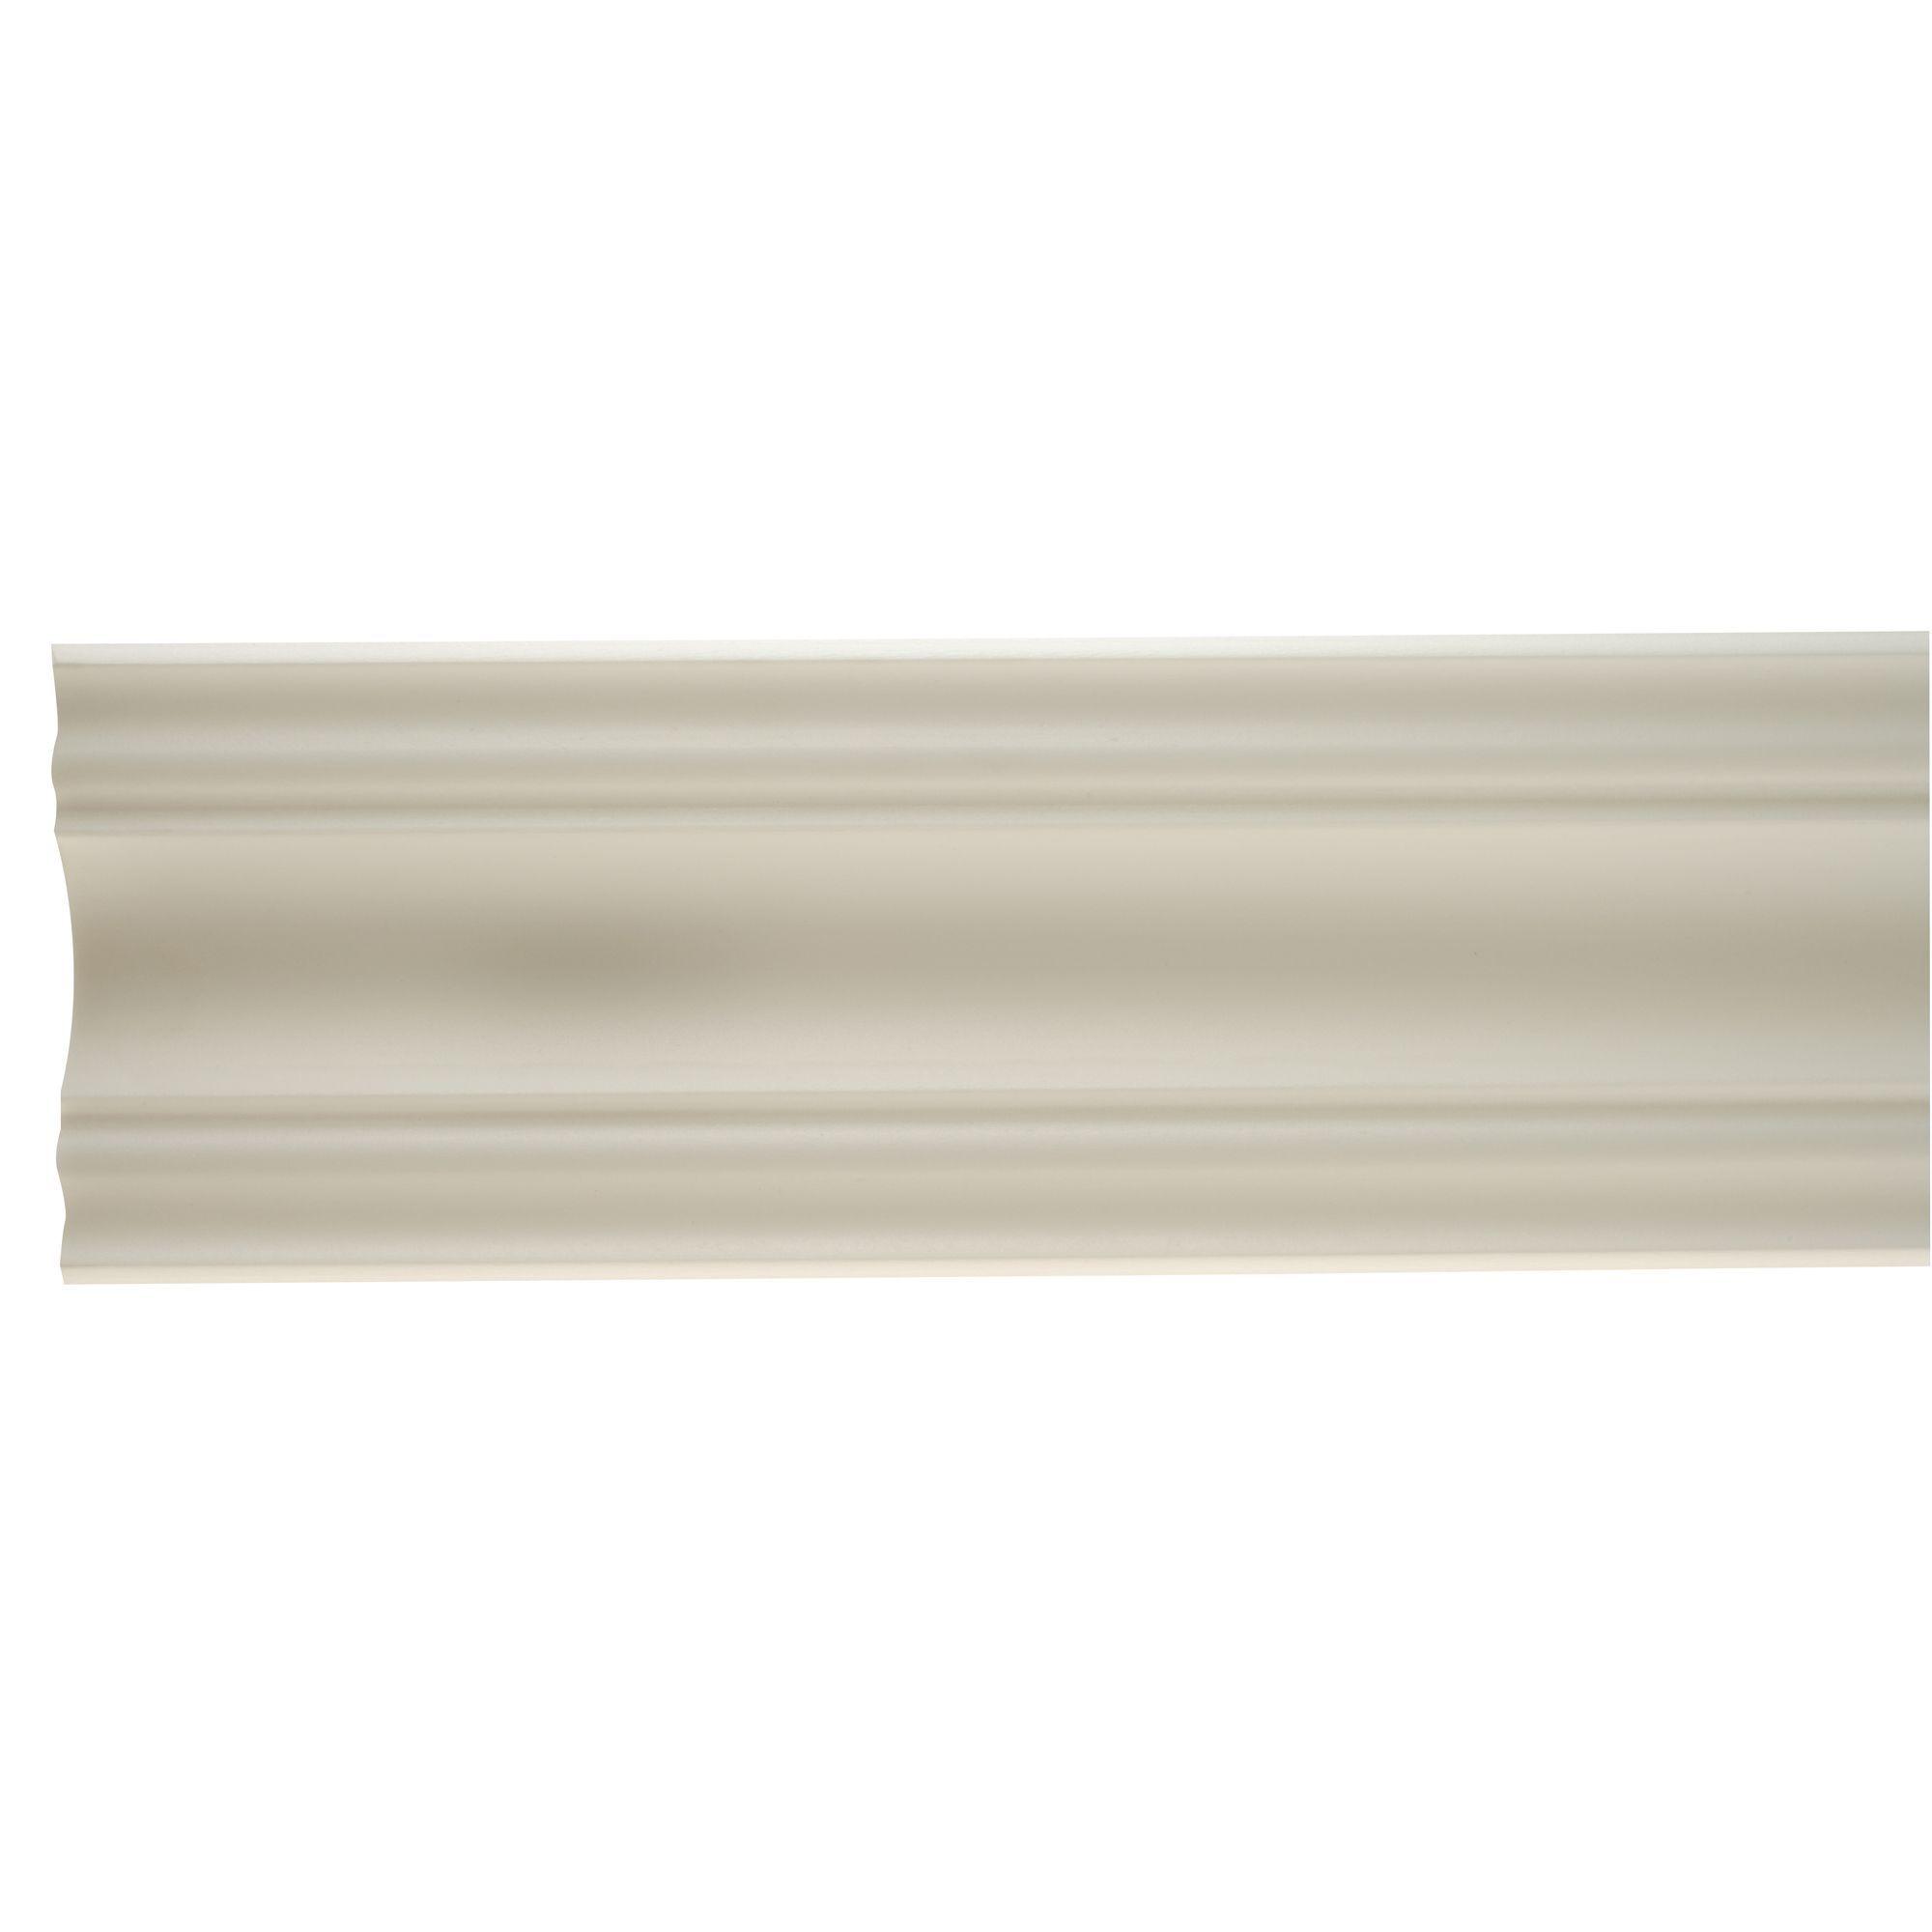 colours polystyrene white coving l 2m pack of 6. Black Bedroom Furniture Sets. Home Design Ideas